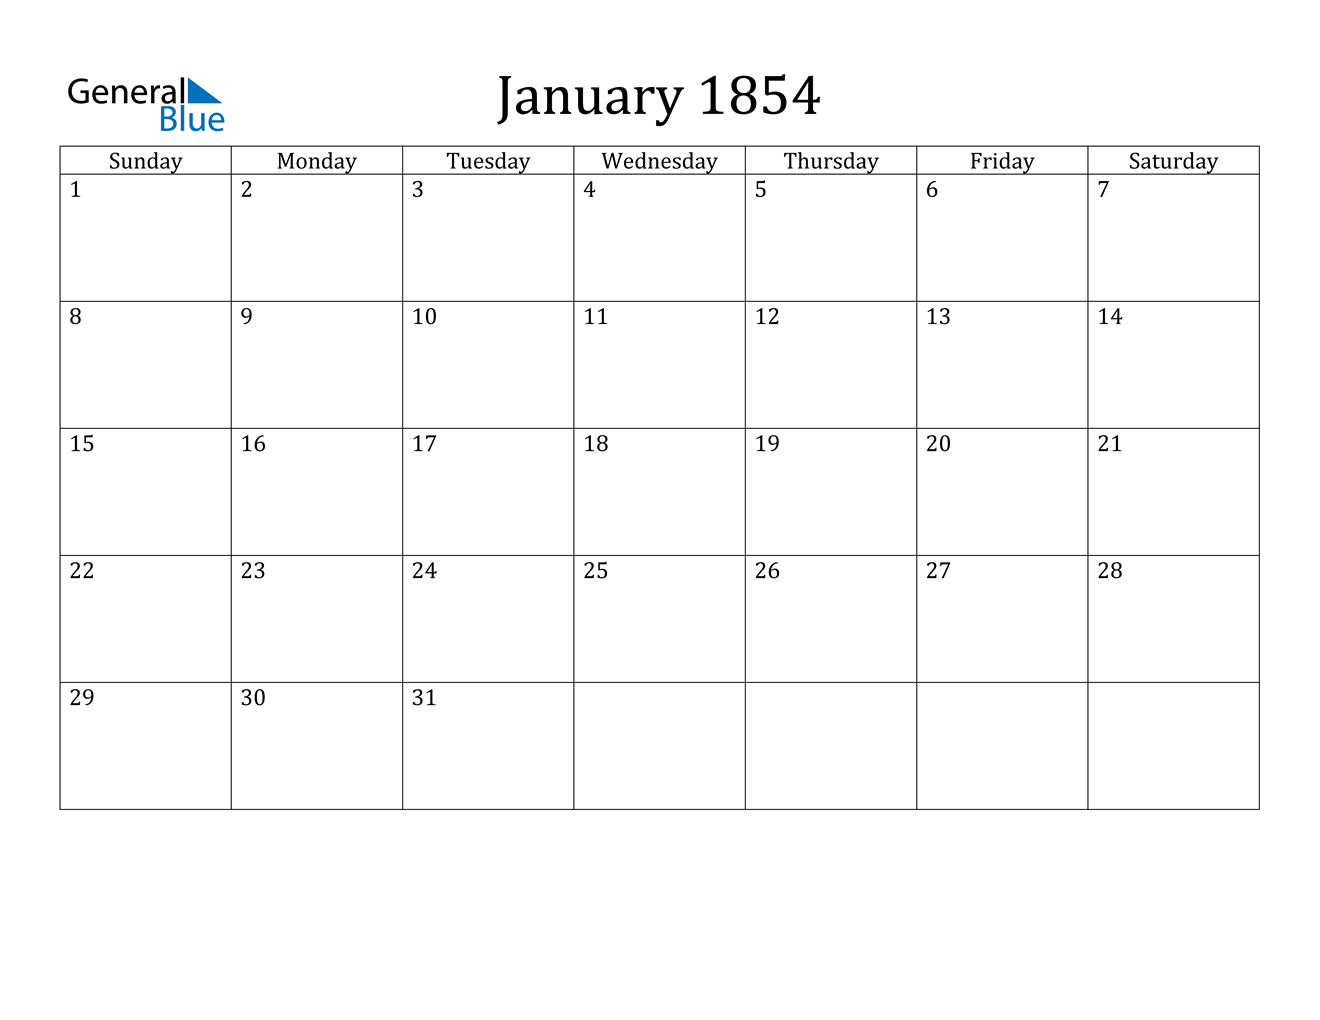 Image of January 1854 Calendar